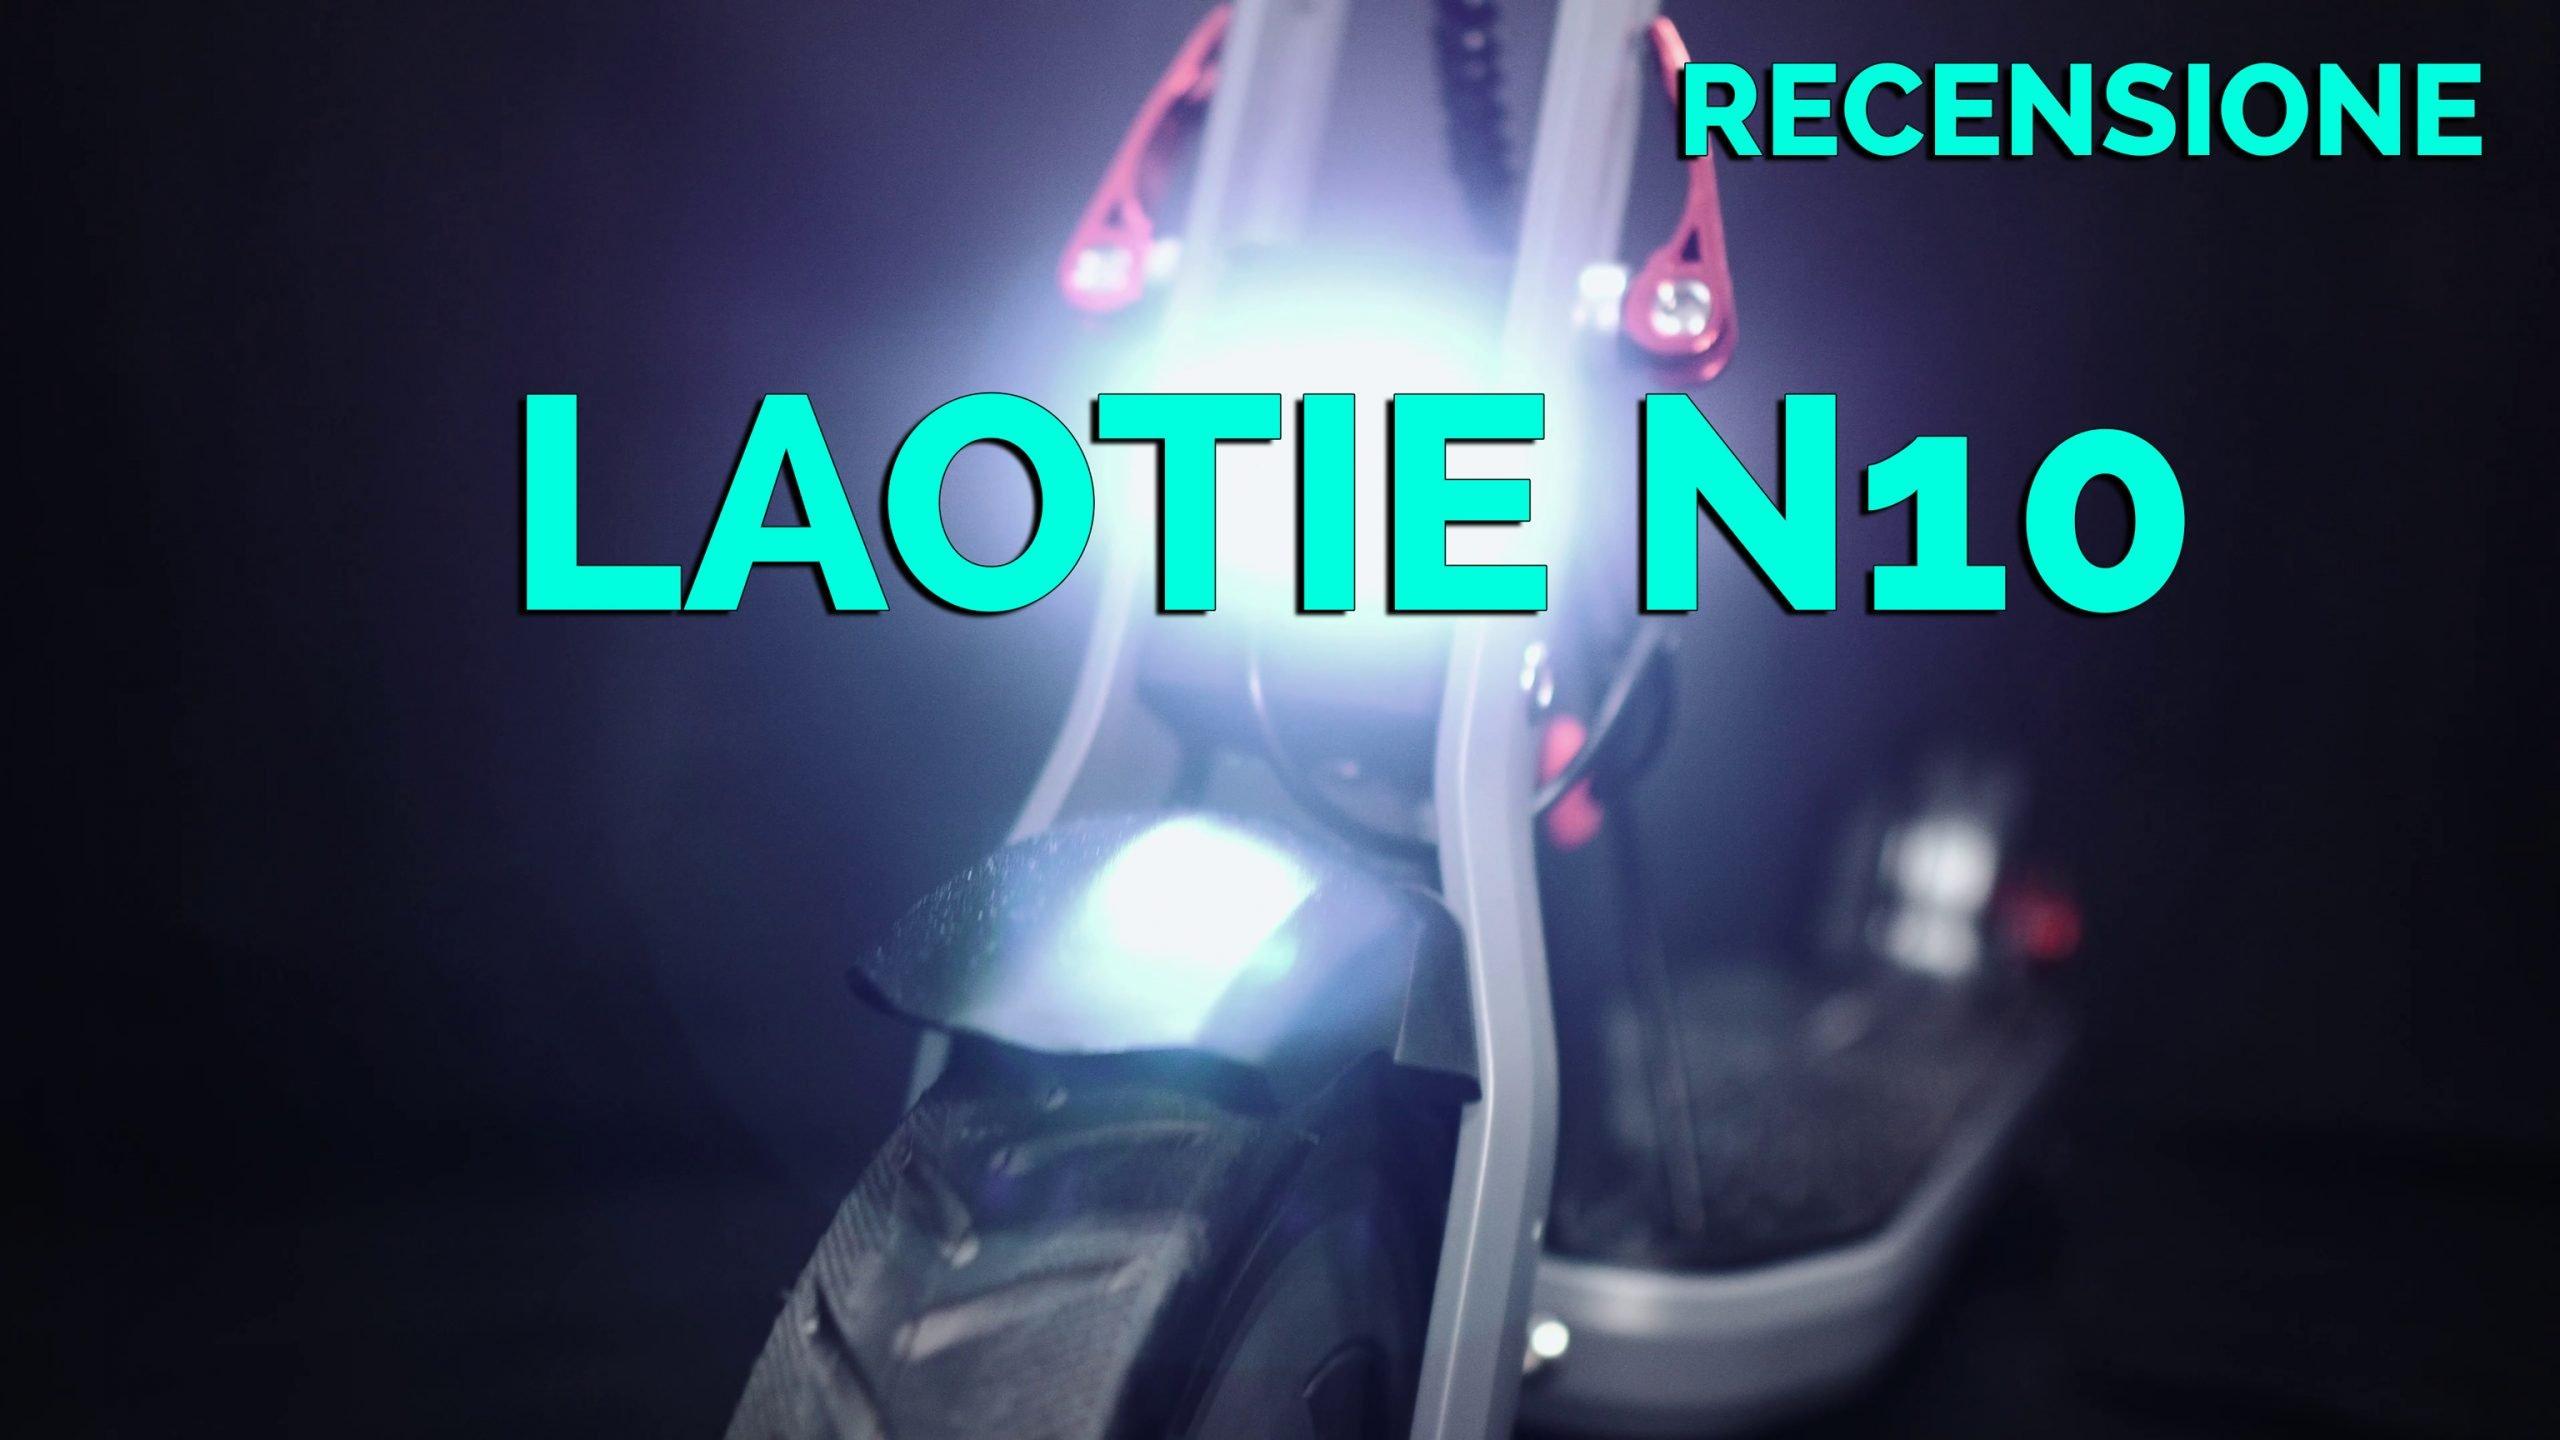 lAOTIE n10 RECENSIONE